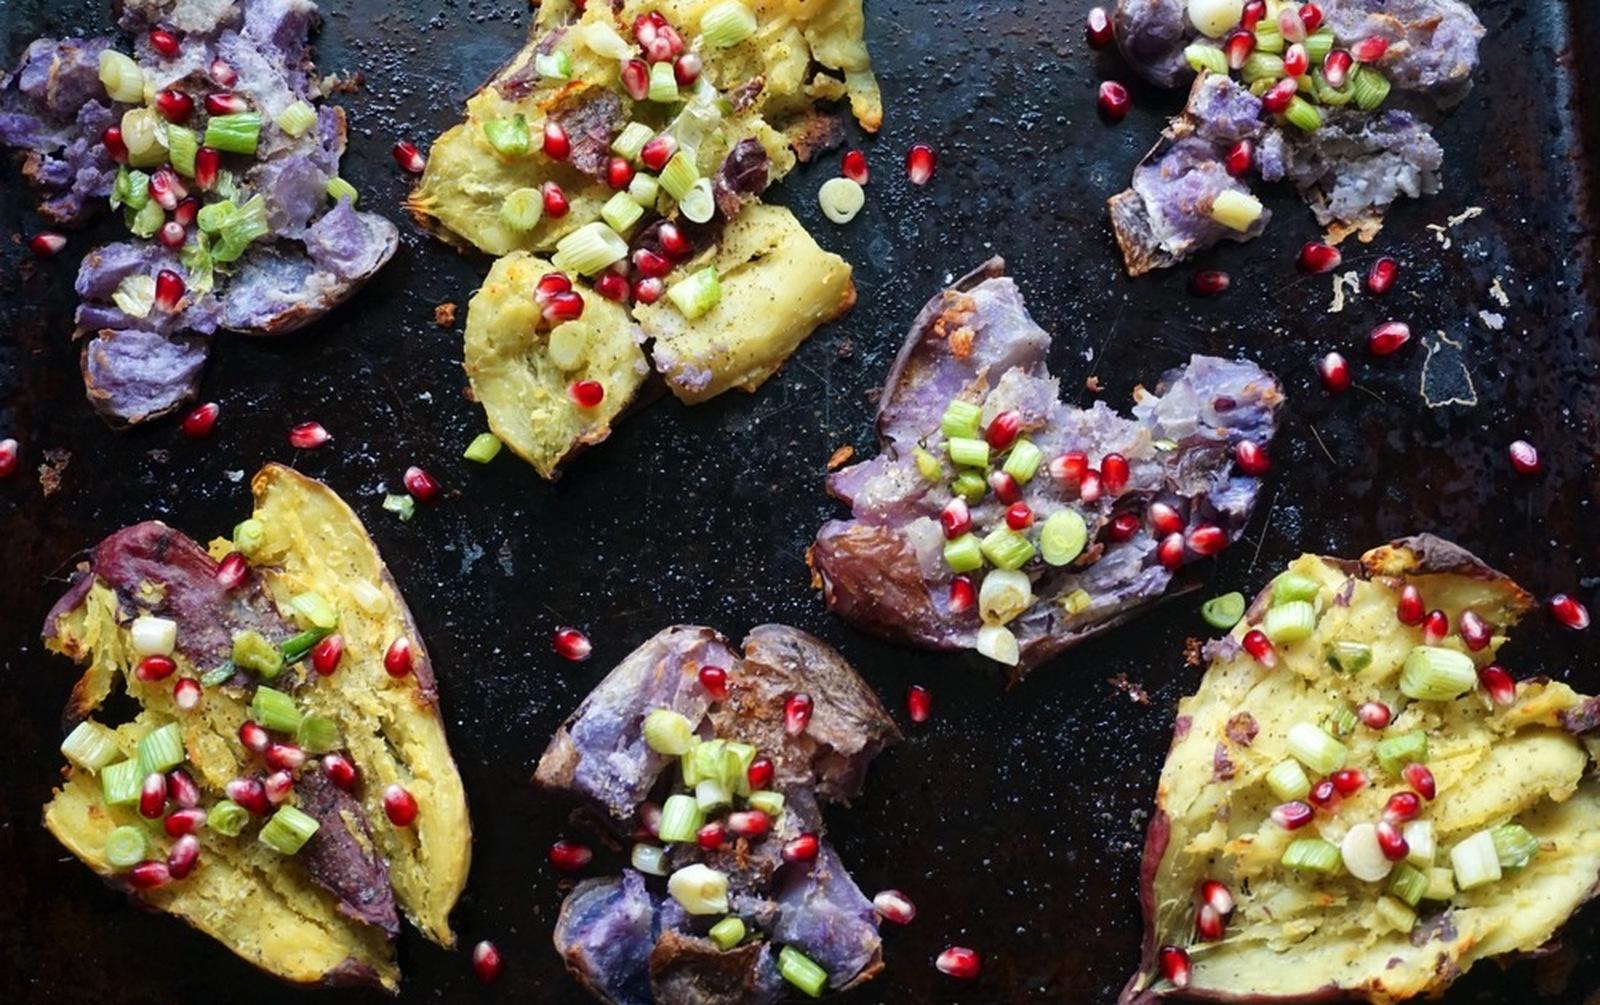 Vegan Loaded Crispy Smashed Sweet Potatoes With Avocado Roasted Chile Crema